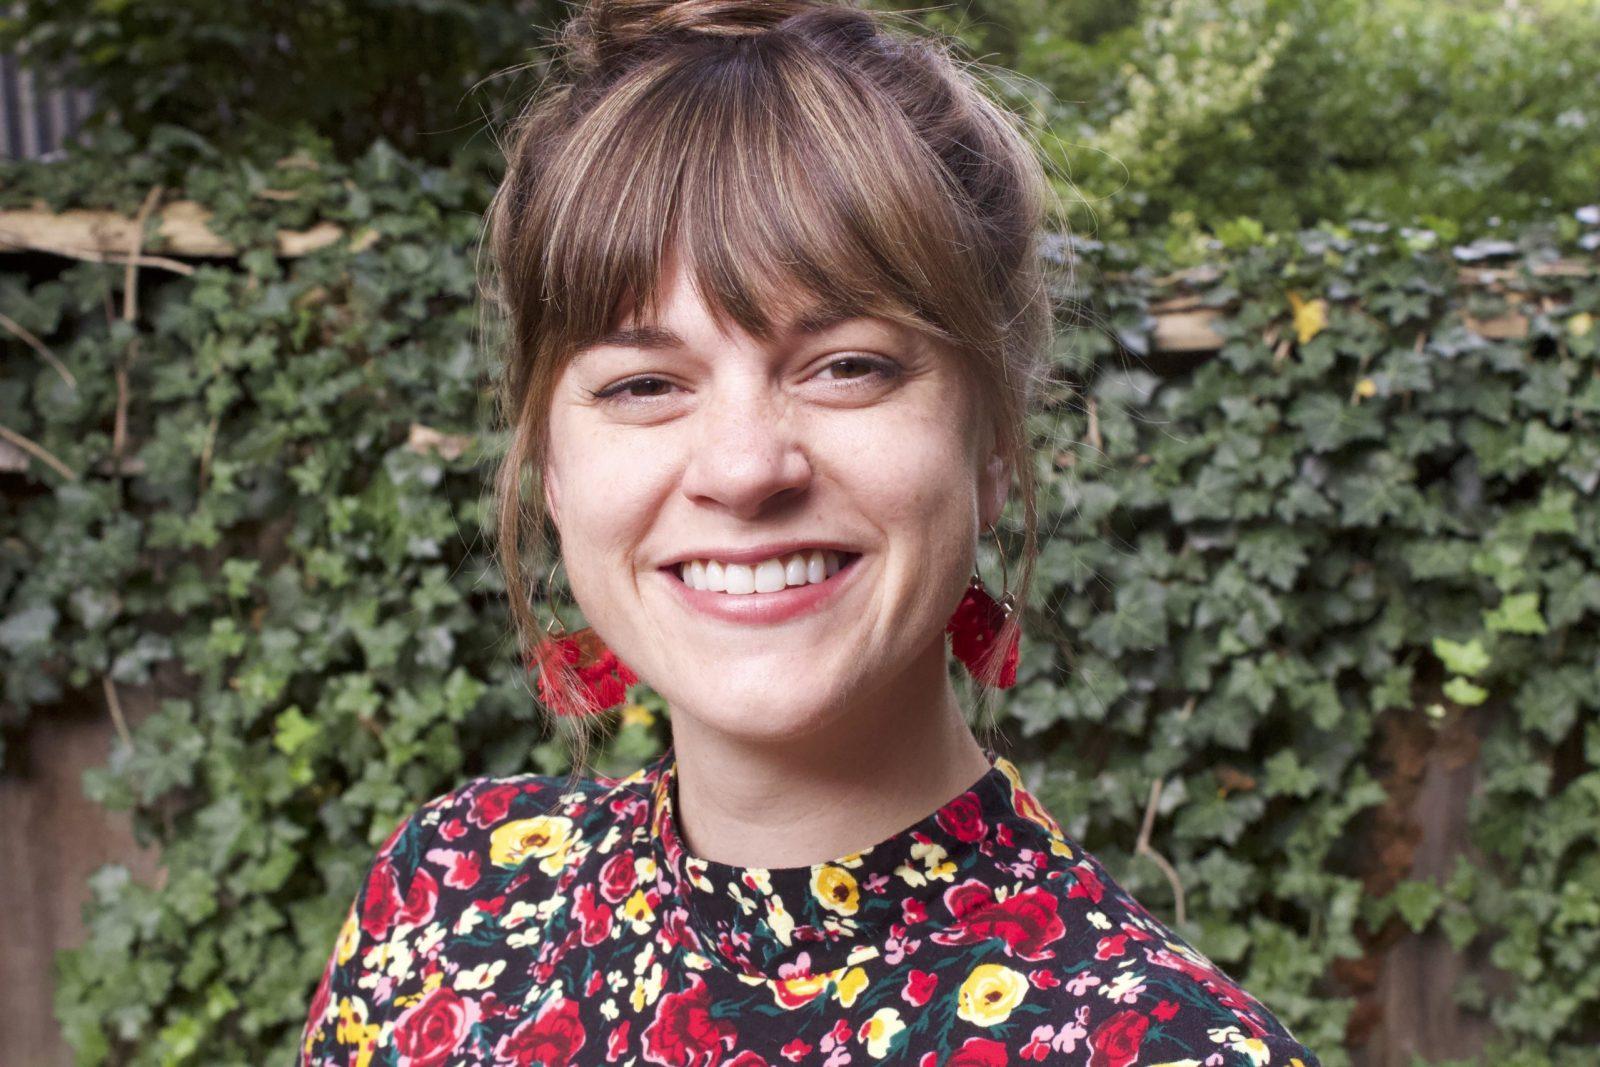 Leah Pollock photo